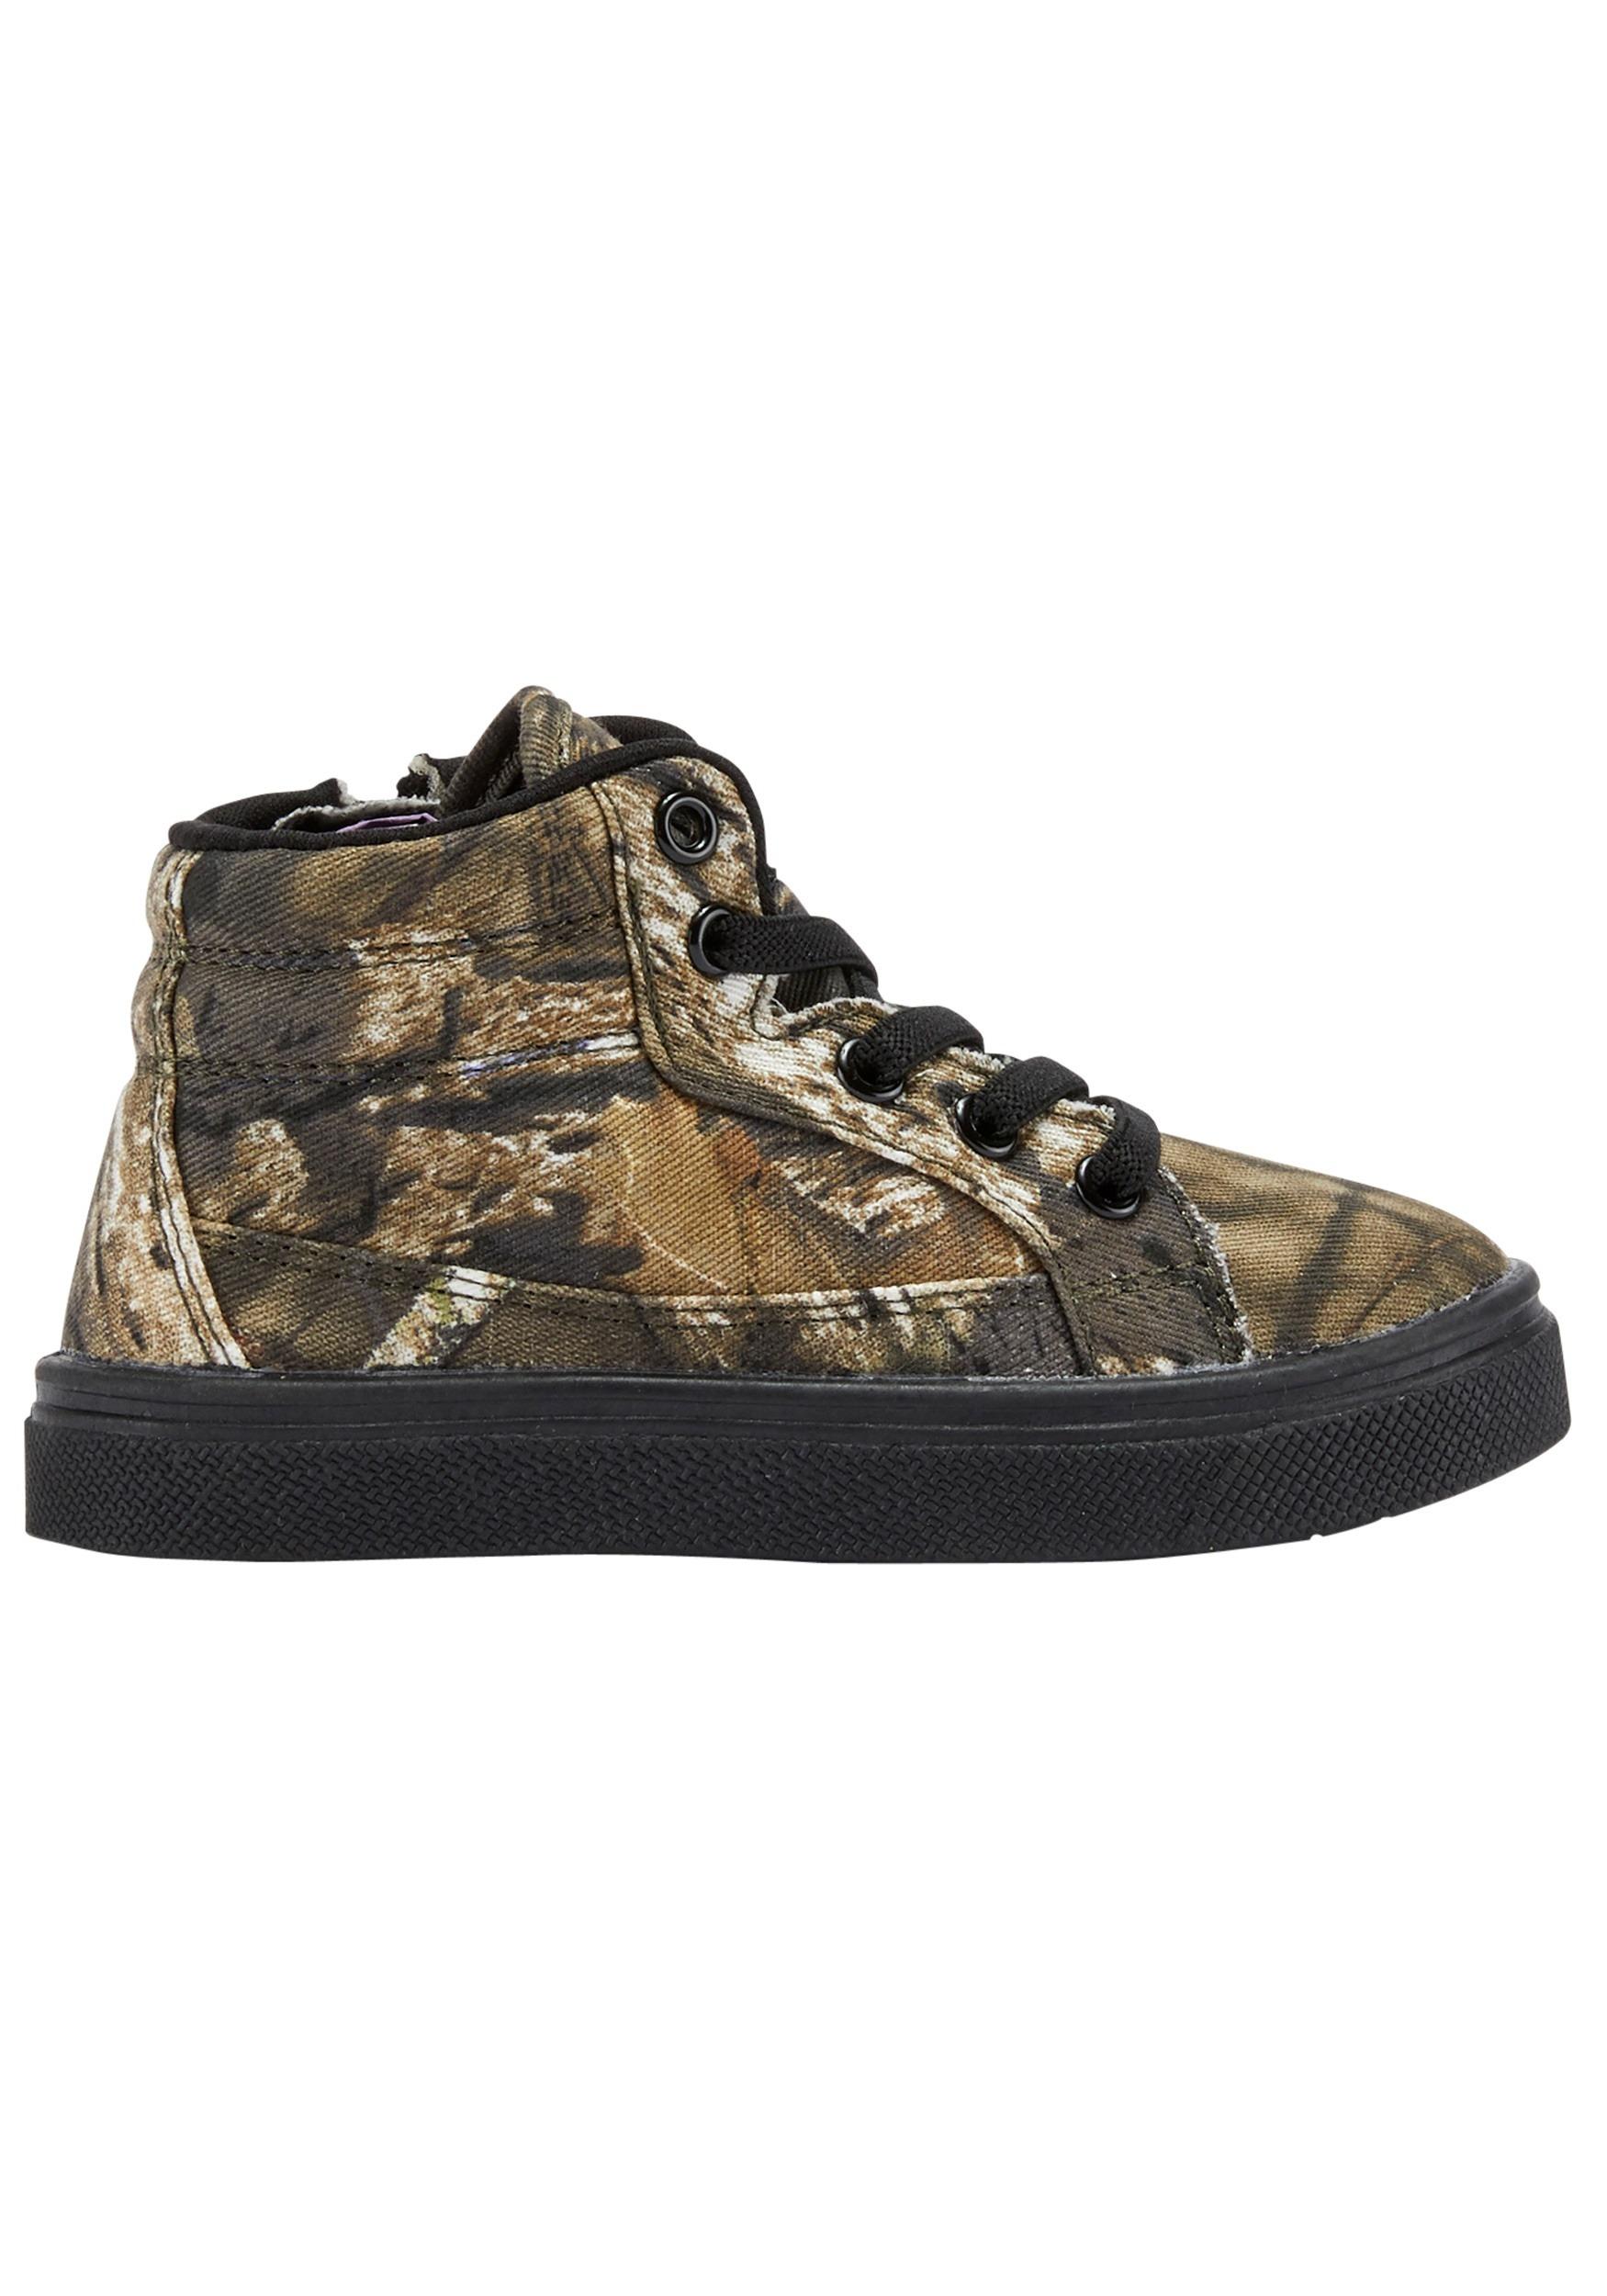 Break Up Country Tyler Child Mossy Oak Shoes